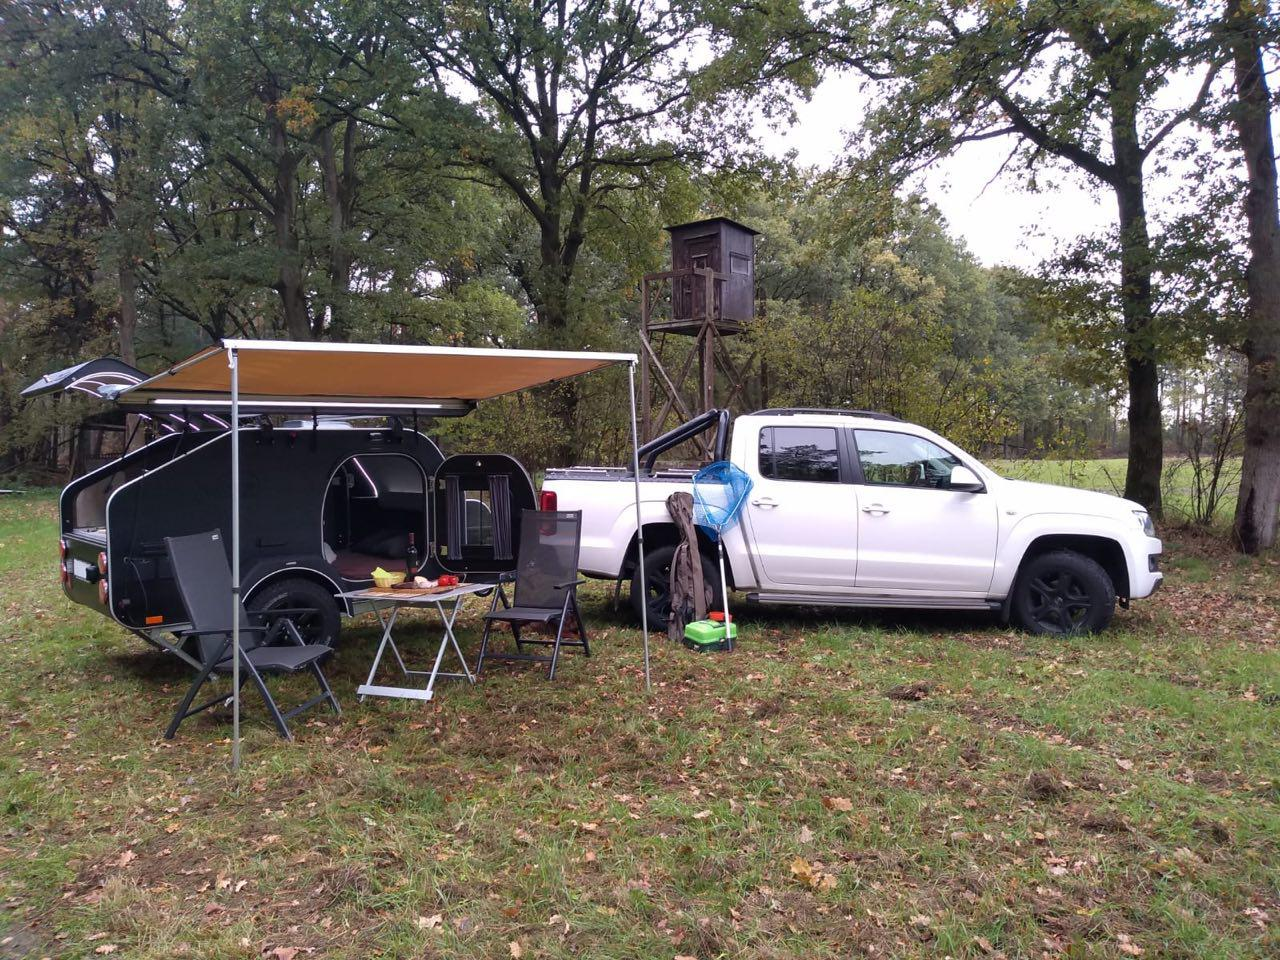 Кемпер X-Line вместо палатки для путешествий